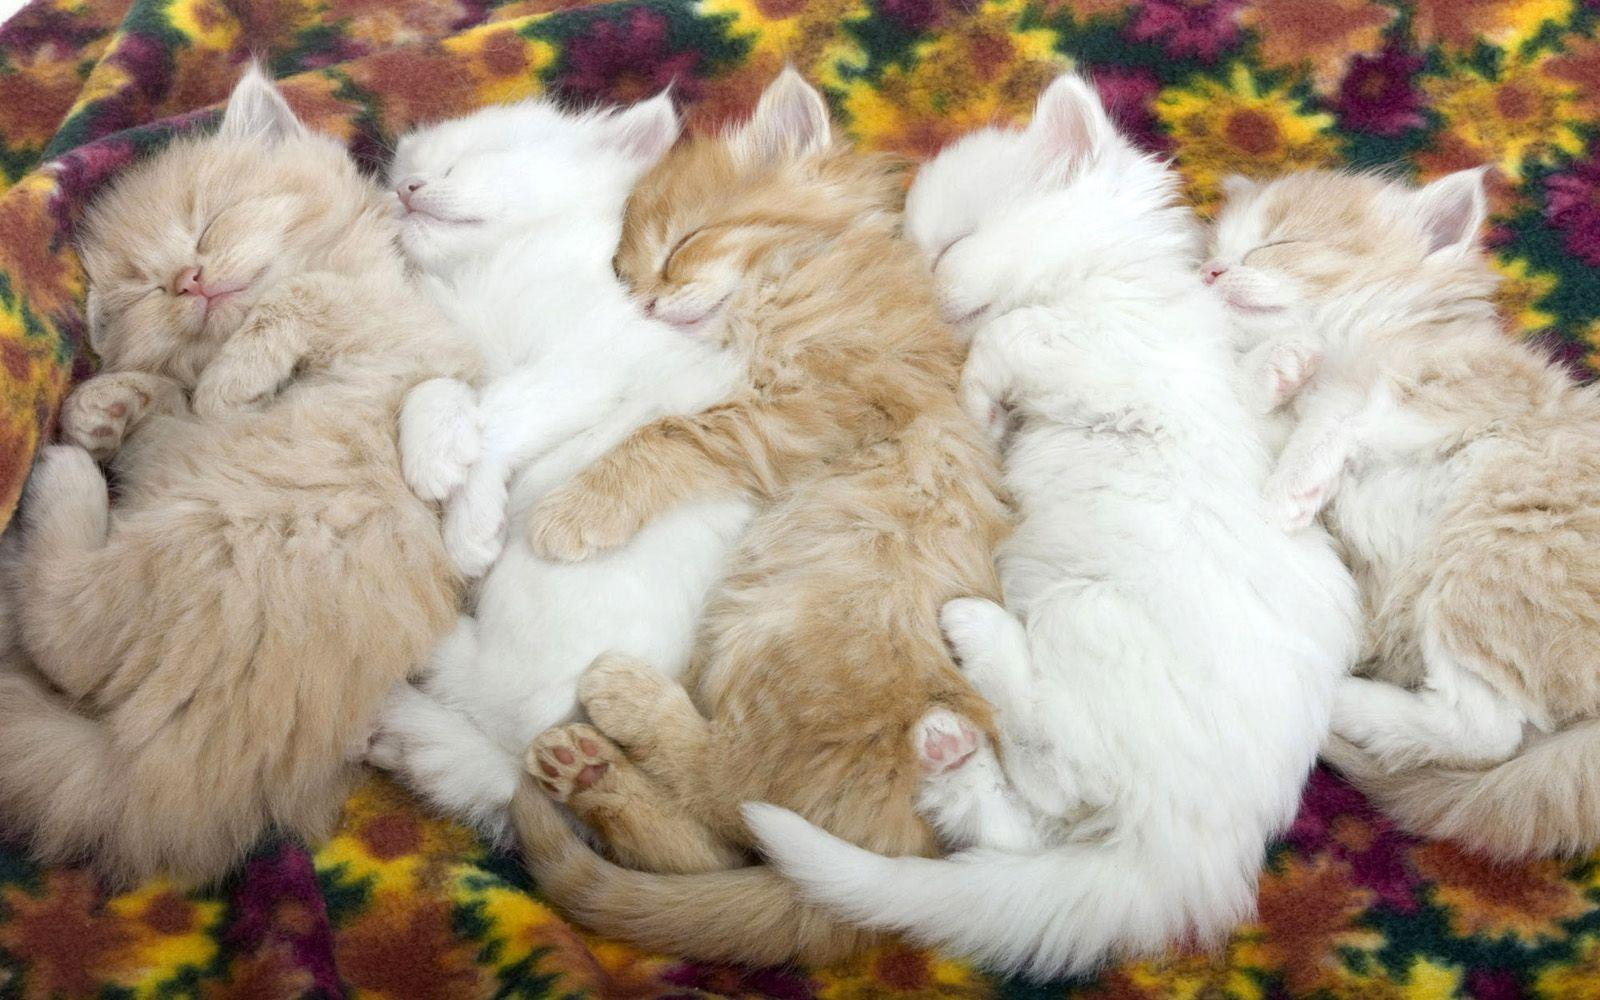 Cute Sleeping Kittens Wallpaper